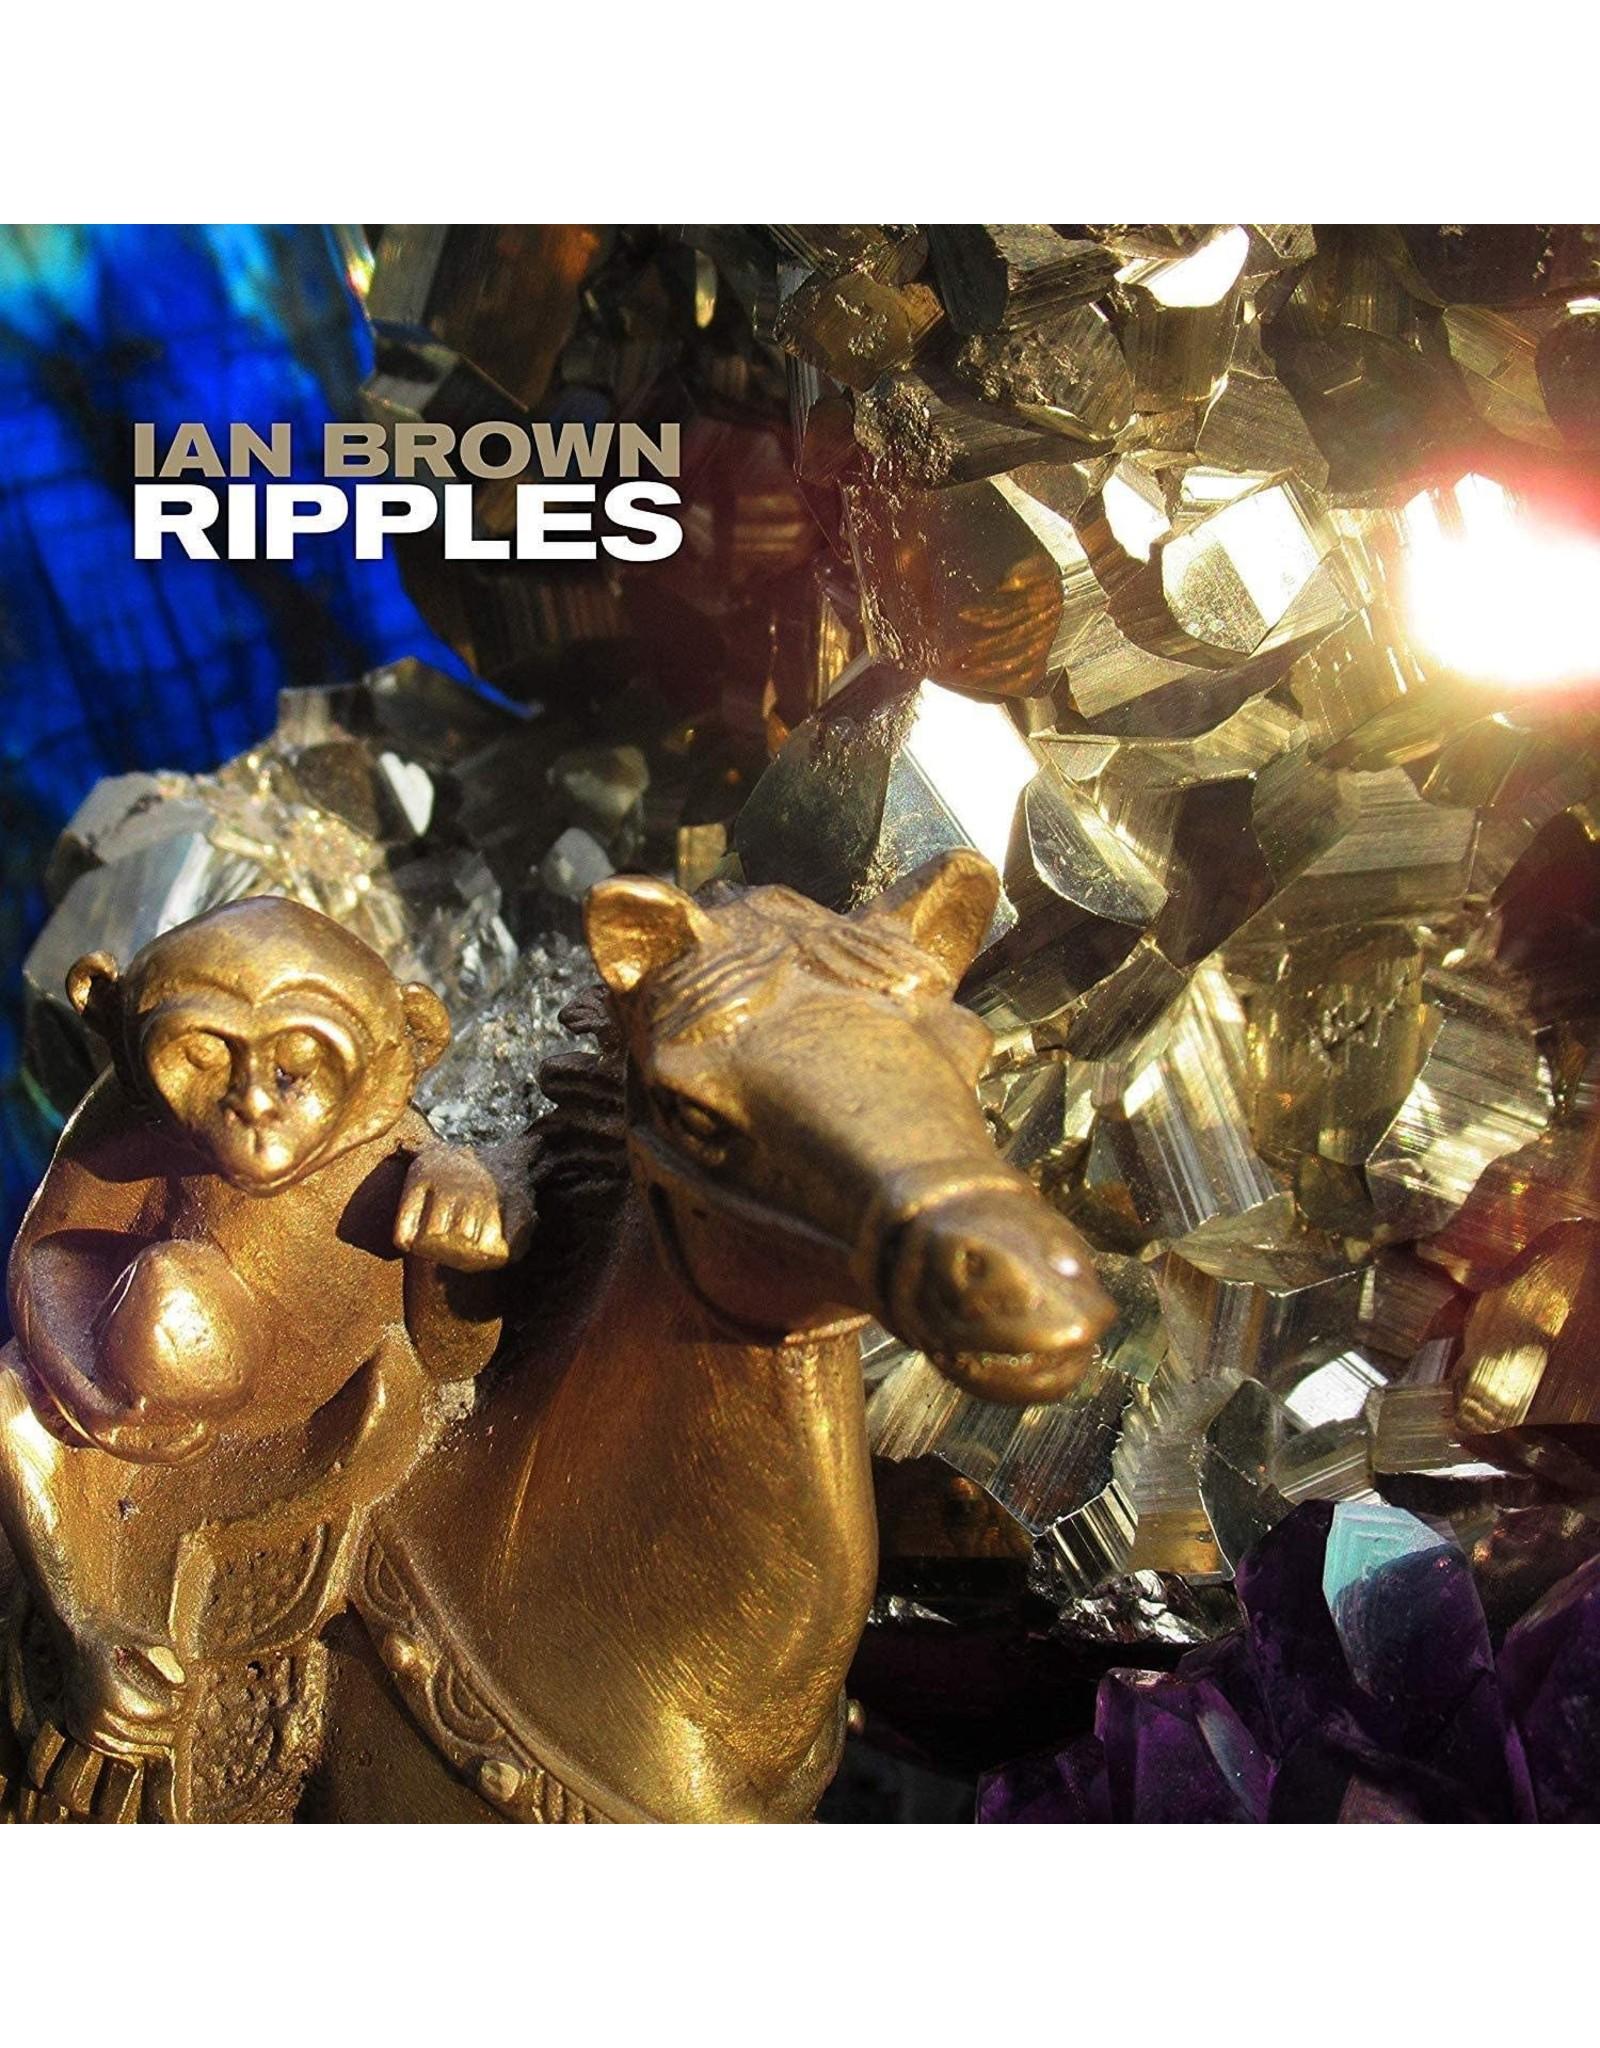 Brown, Ian - Ripples LP